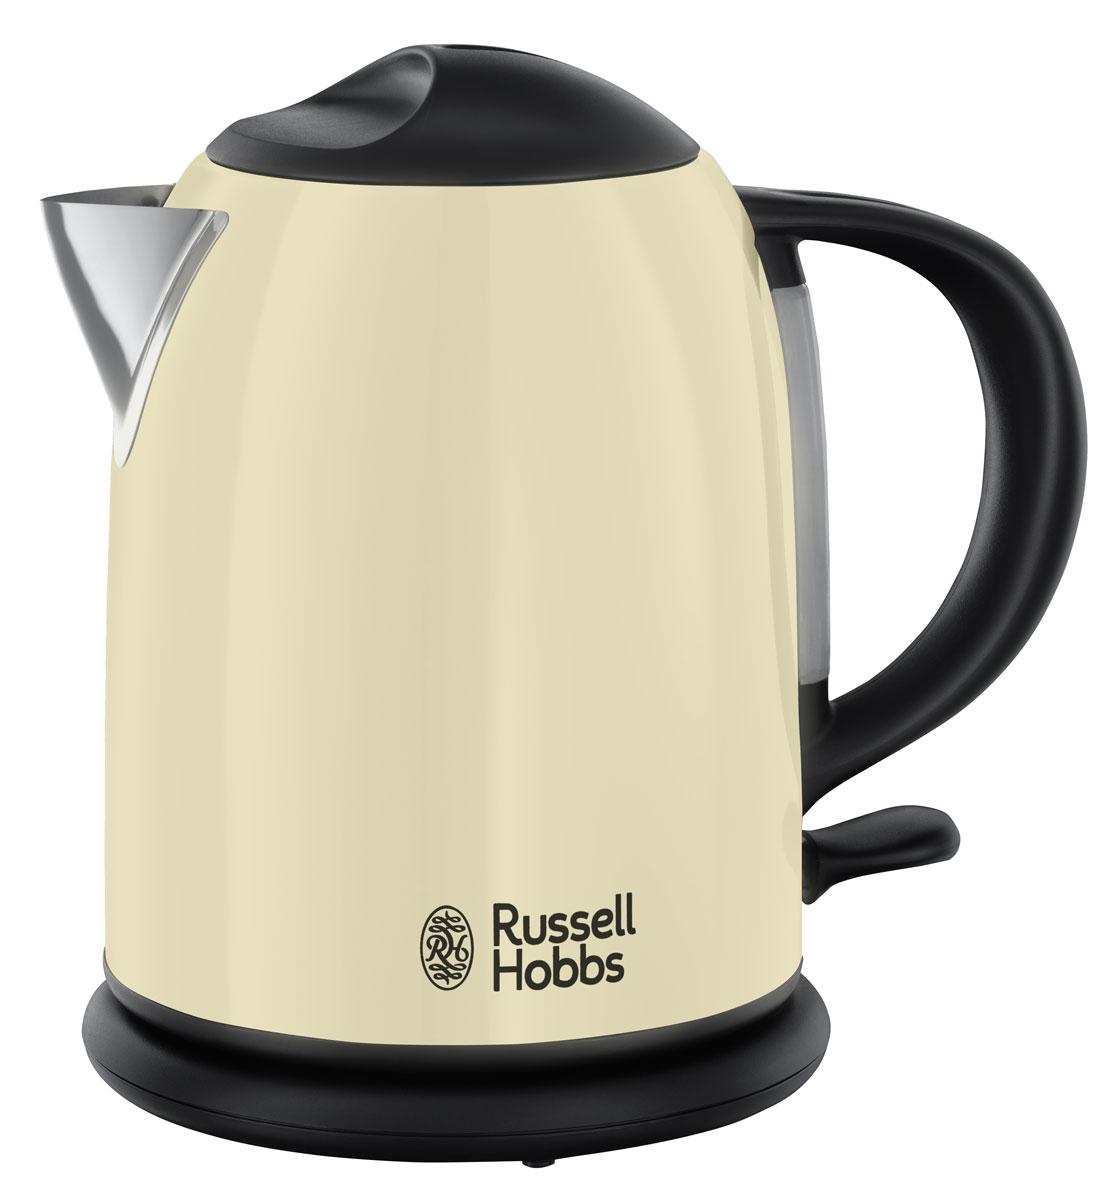 Russell Hobbs Colours Classic Cream 20194-70 электрический чайник